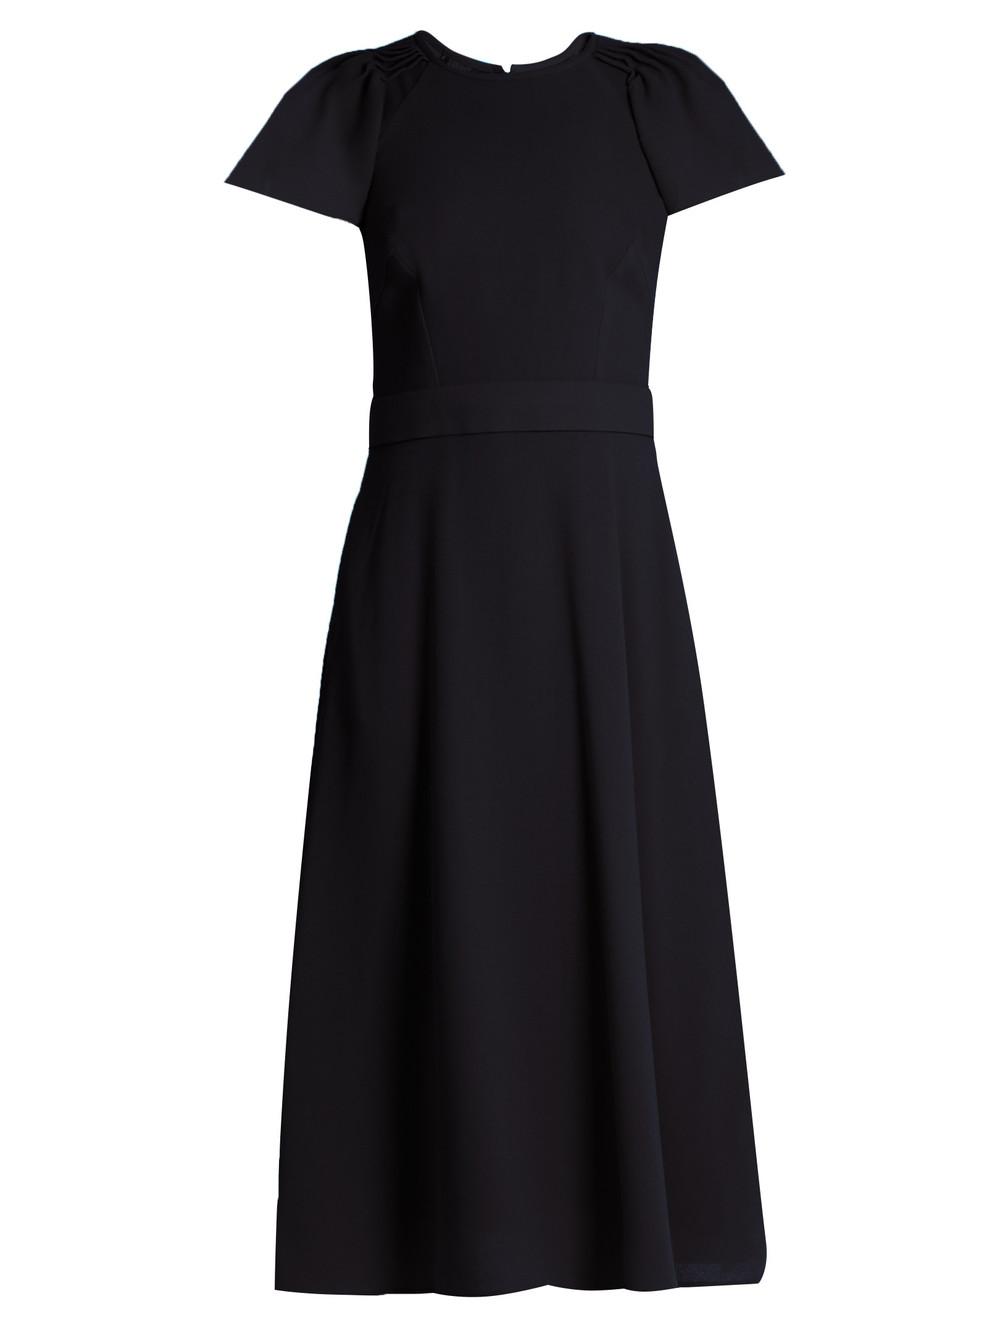 0cc6572c9f0 GOAT Delilah wool-crepe dress - Wheretoget